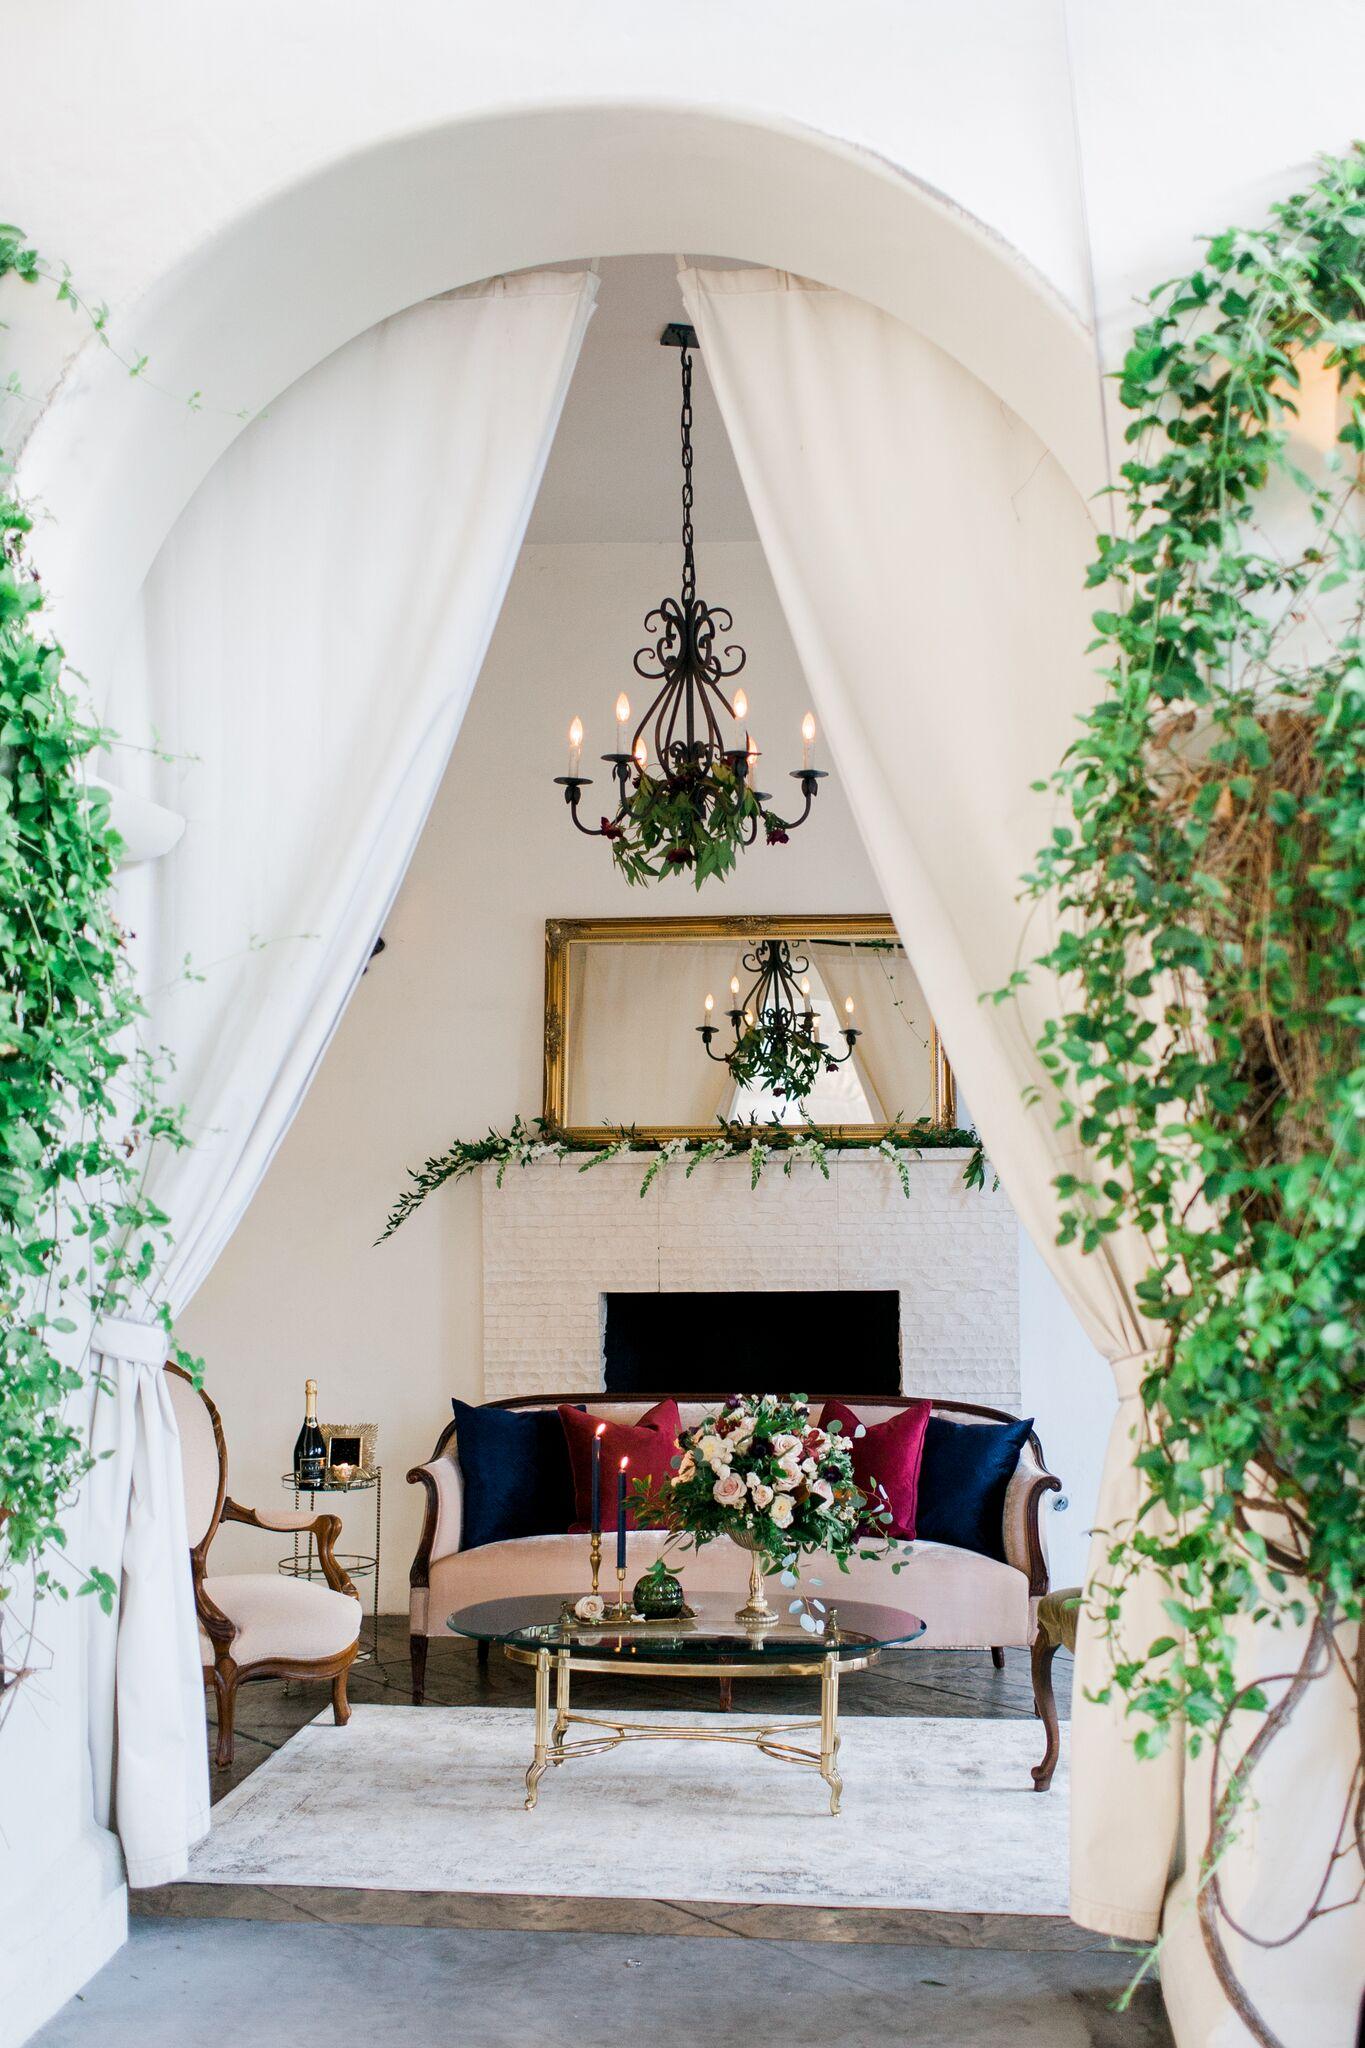 burlap-and-bordeux-steven-leyva-photography-villa-and-vine-wedding-styled-shoot-21_preview.jpg